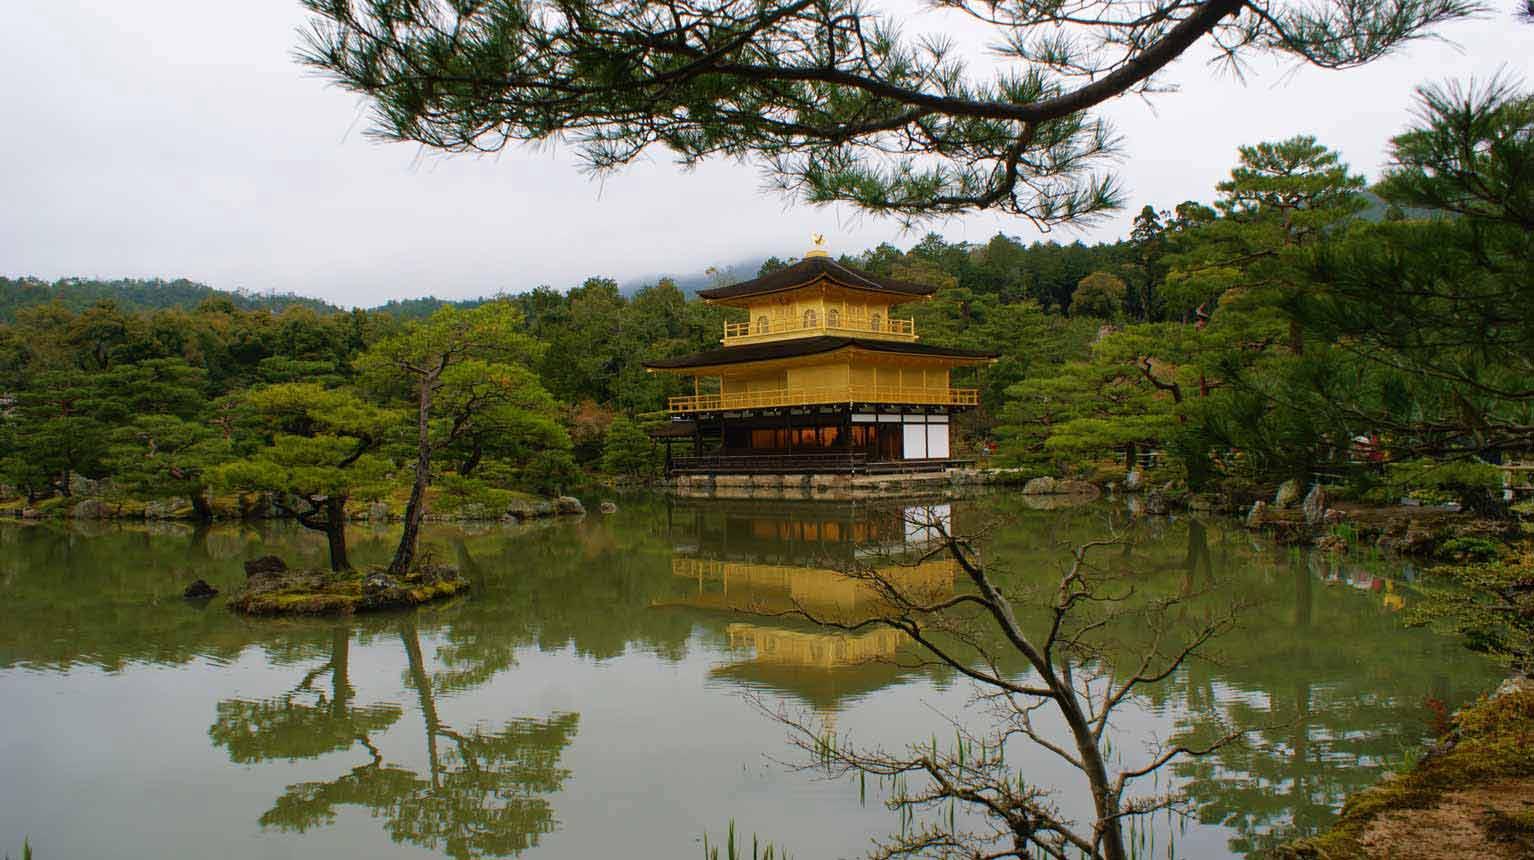 curly nomad asia japan golden temple sakura hanami cherry tree image